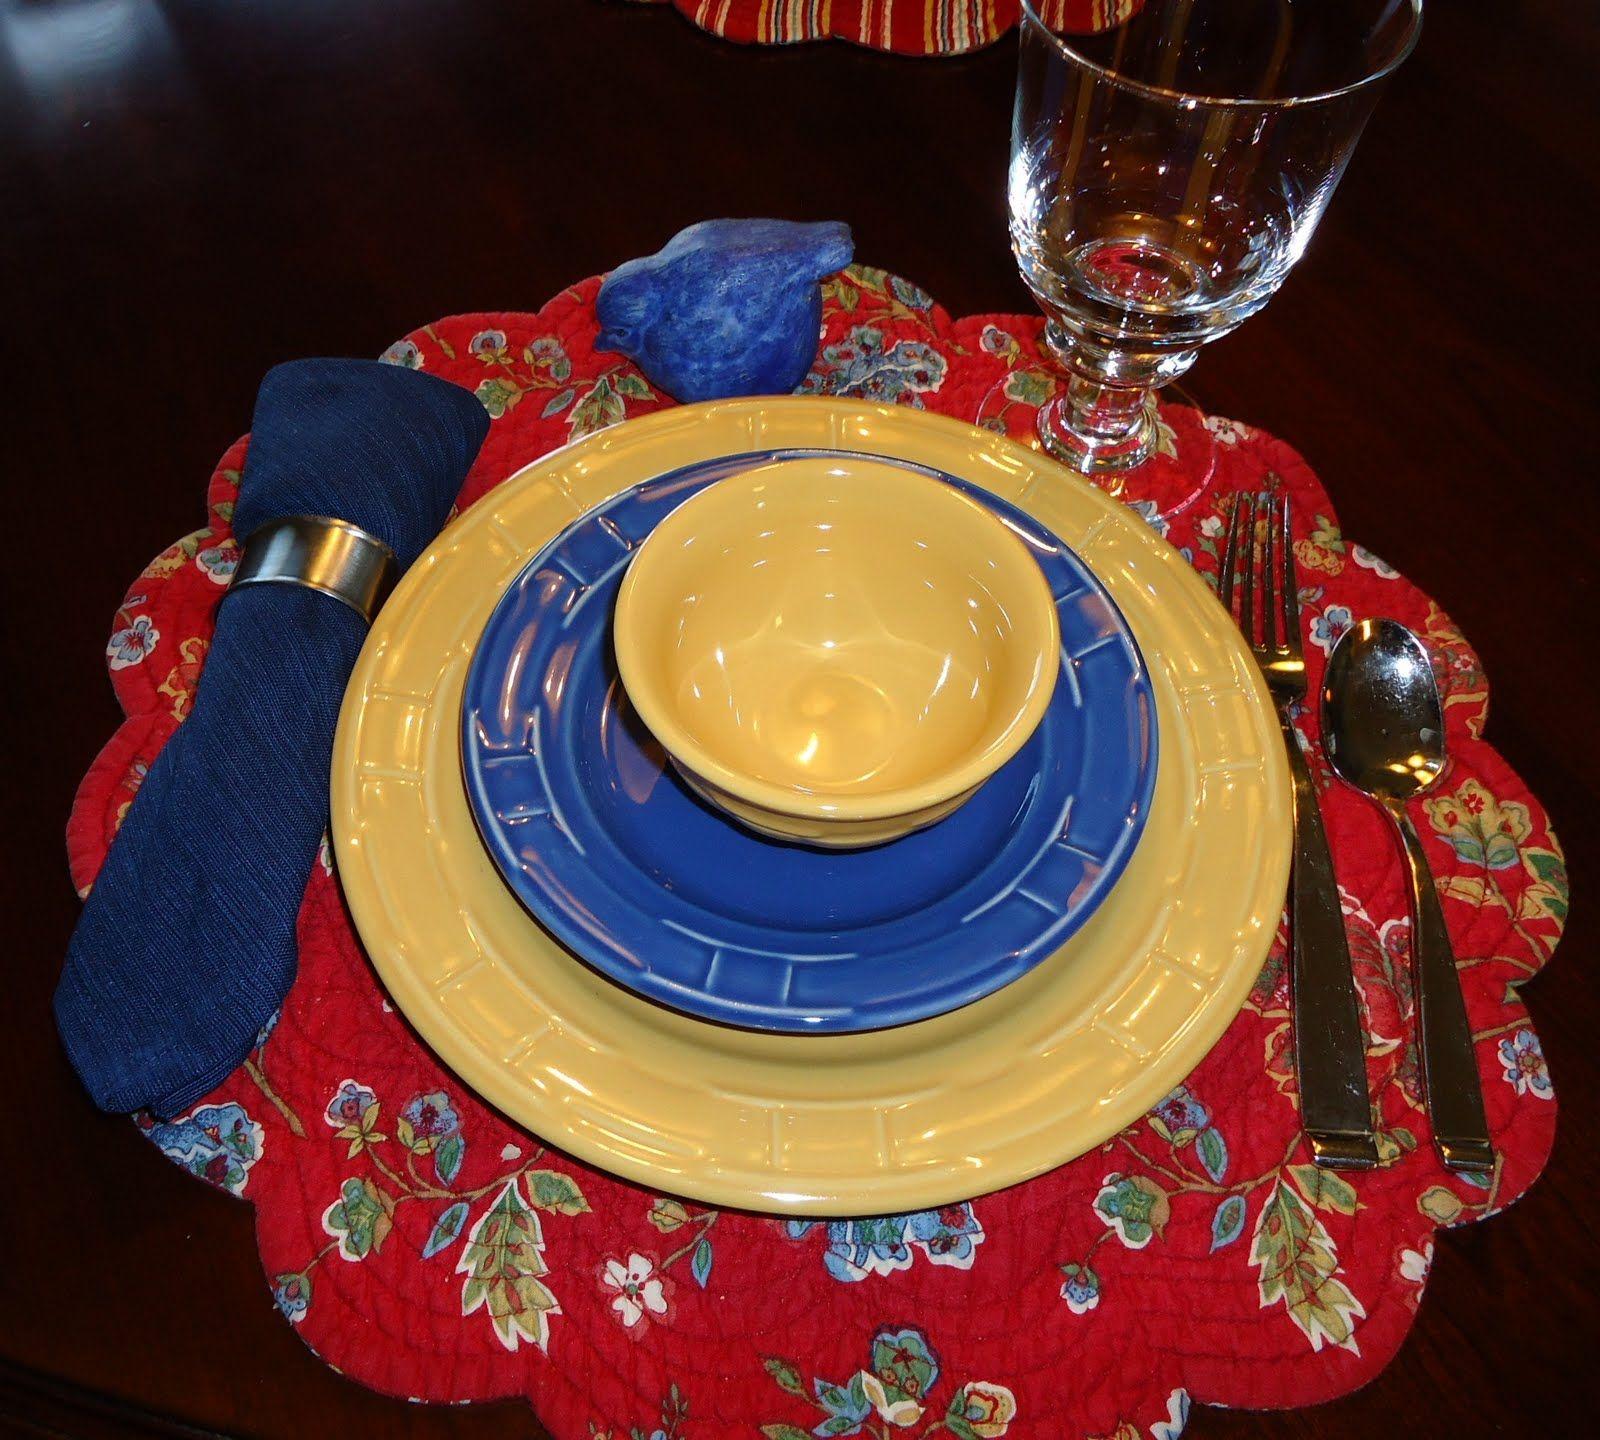 Longaberger pottery place setting | Table Dressing | Pinterest ...